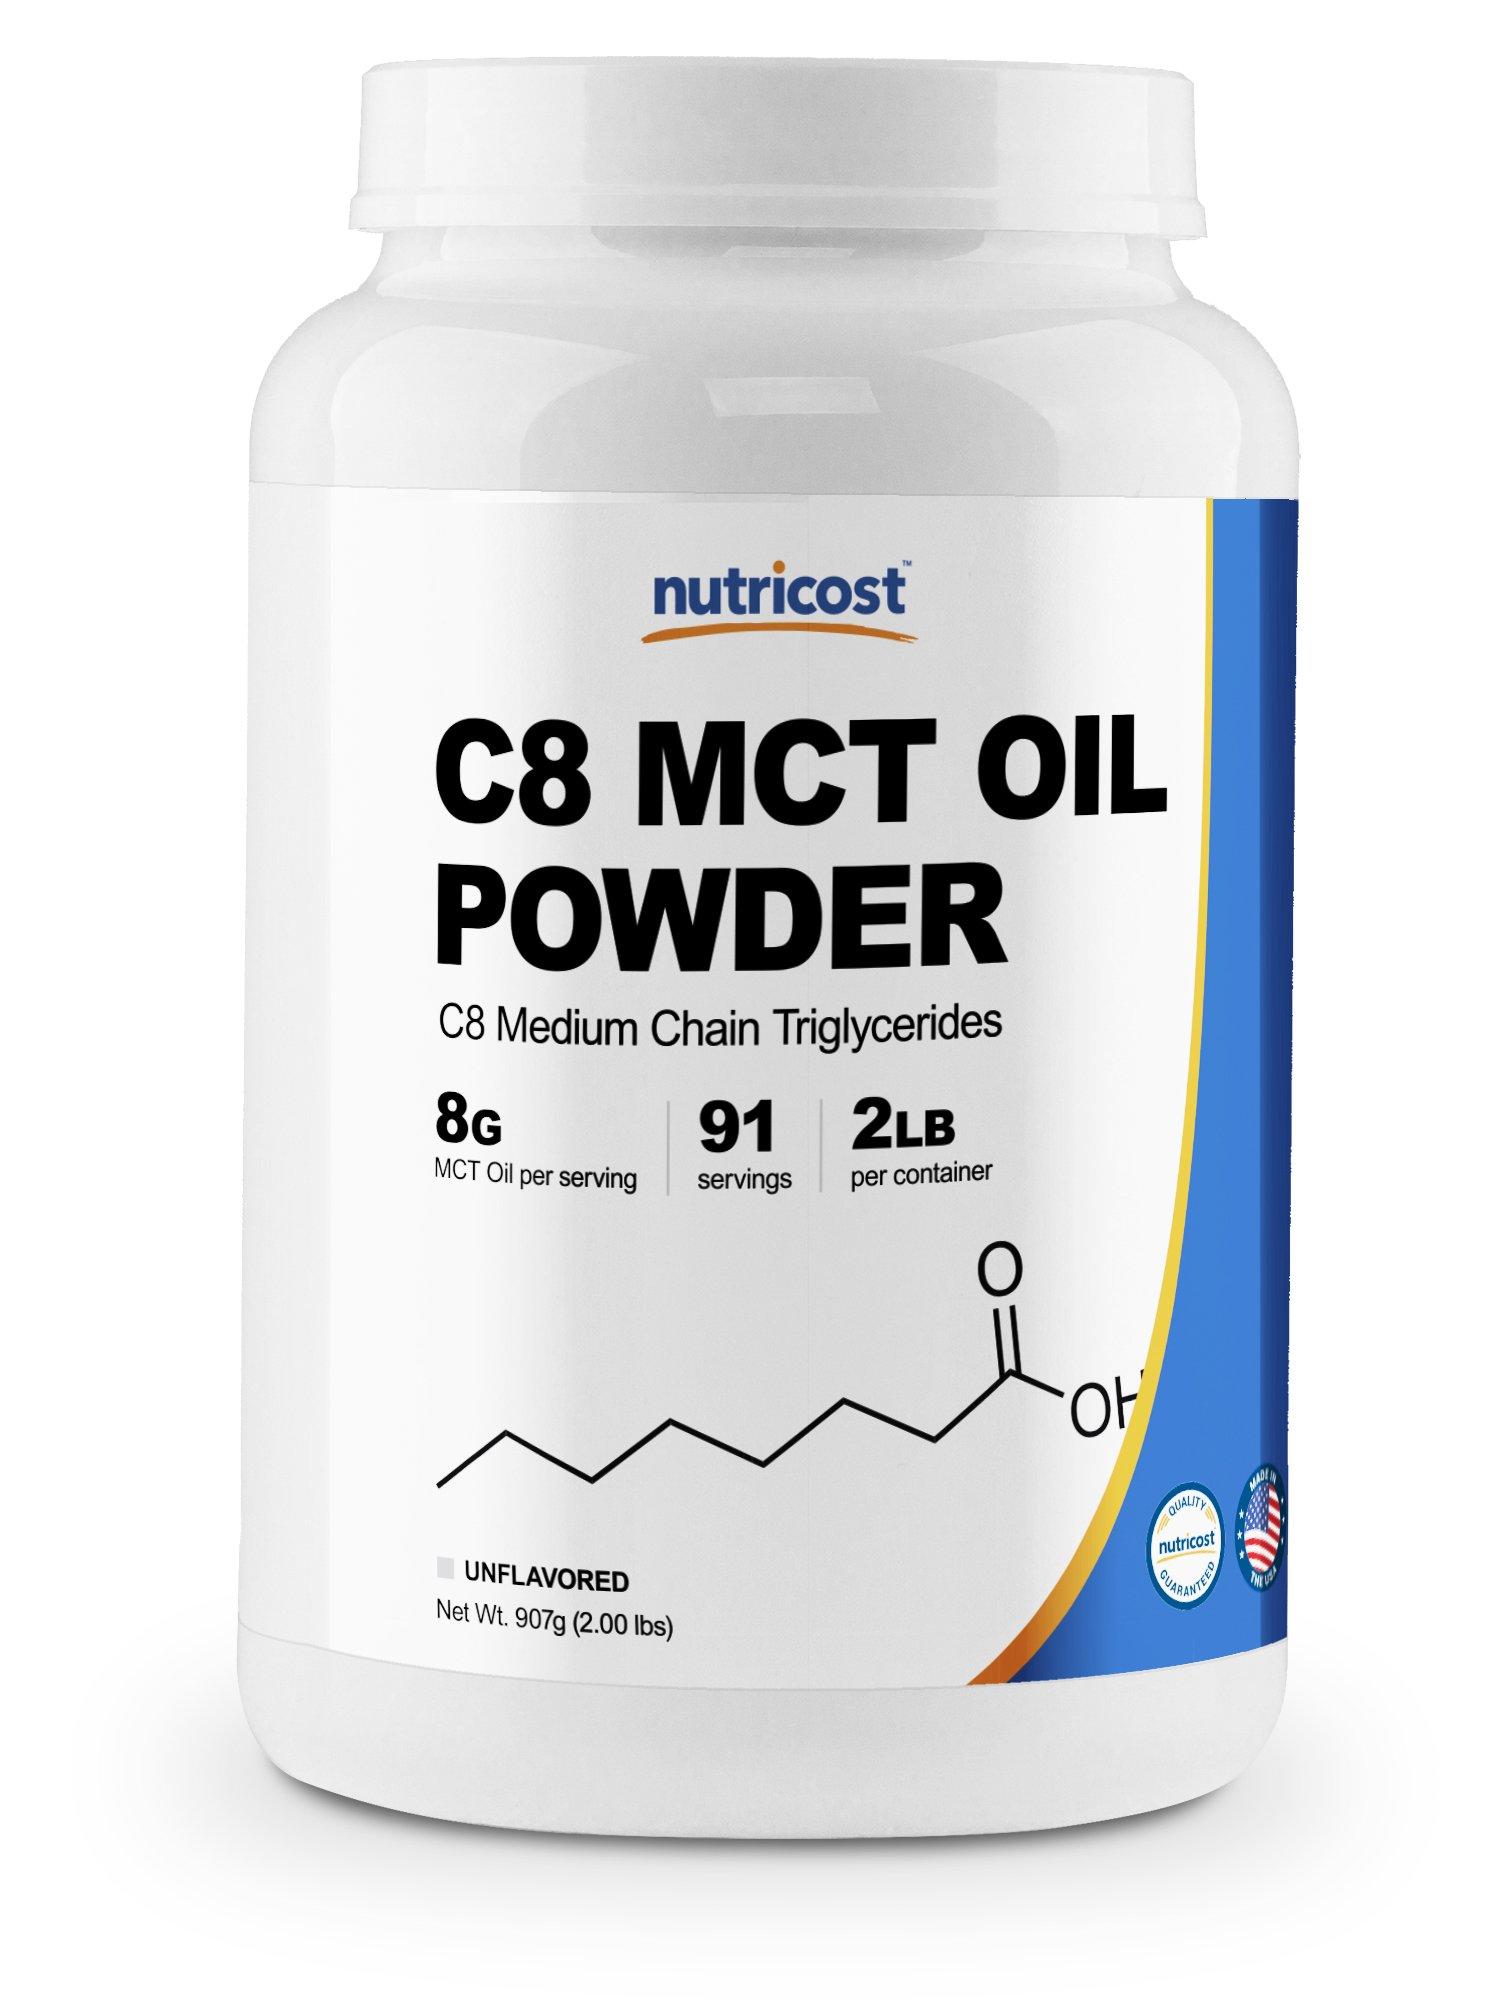 Nutricost C8 MCT Oil Powder 2LBS (32oz) - 95% C8 MCT Oil Powder